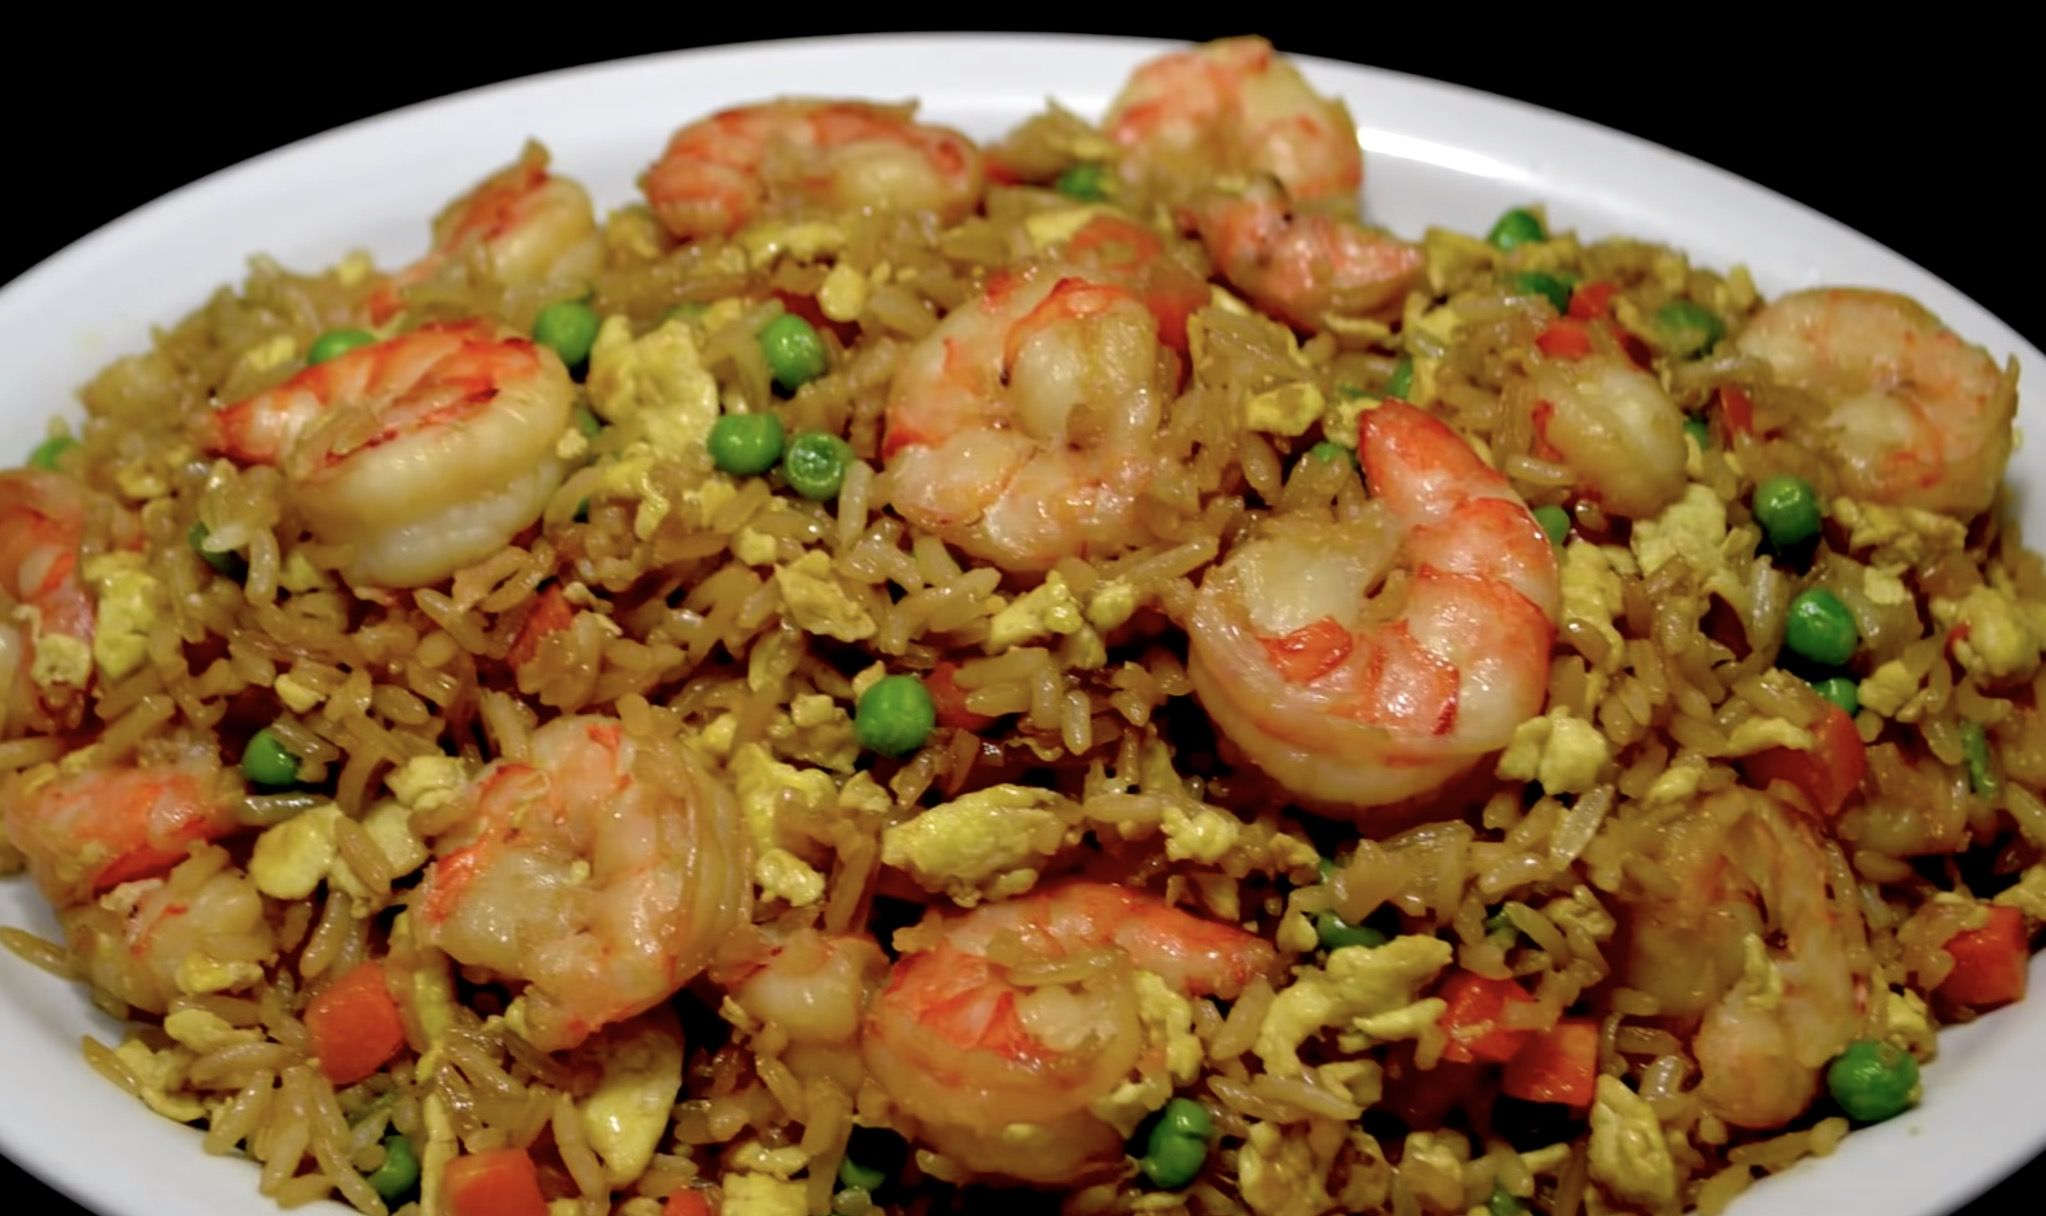 arroz frito chino - arroz frito chino